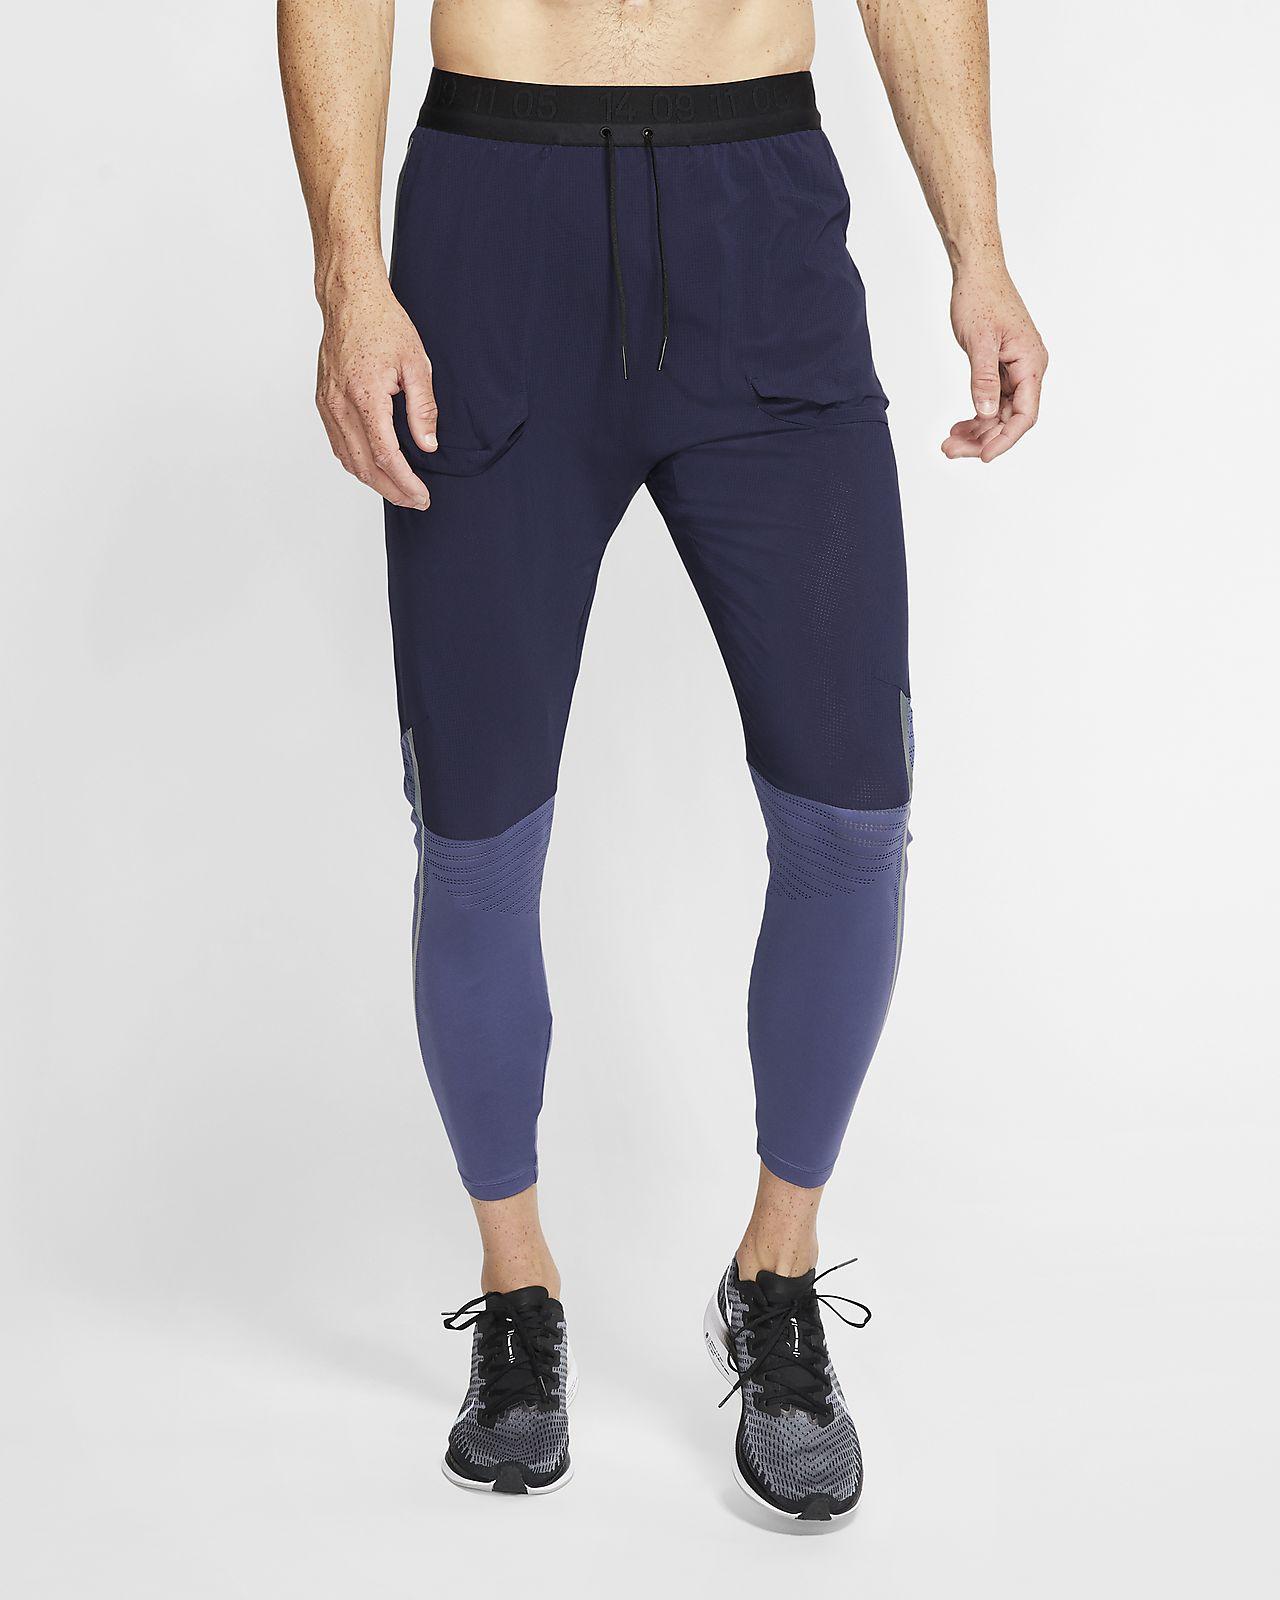 Calças de running Nike Tech Pack para homem